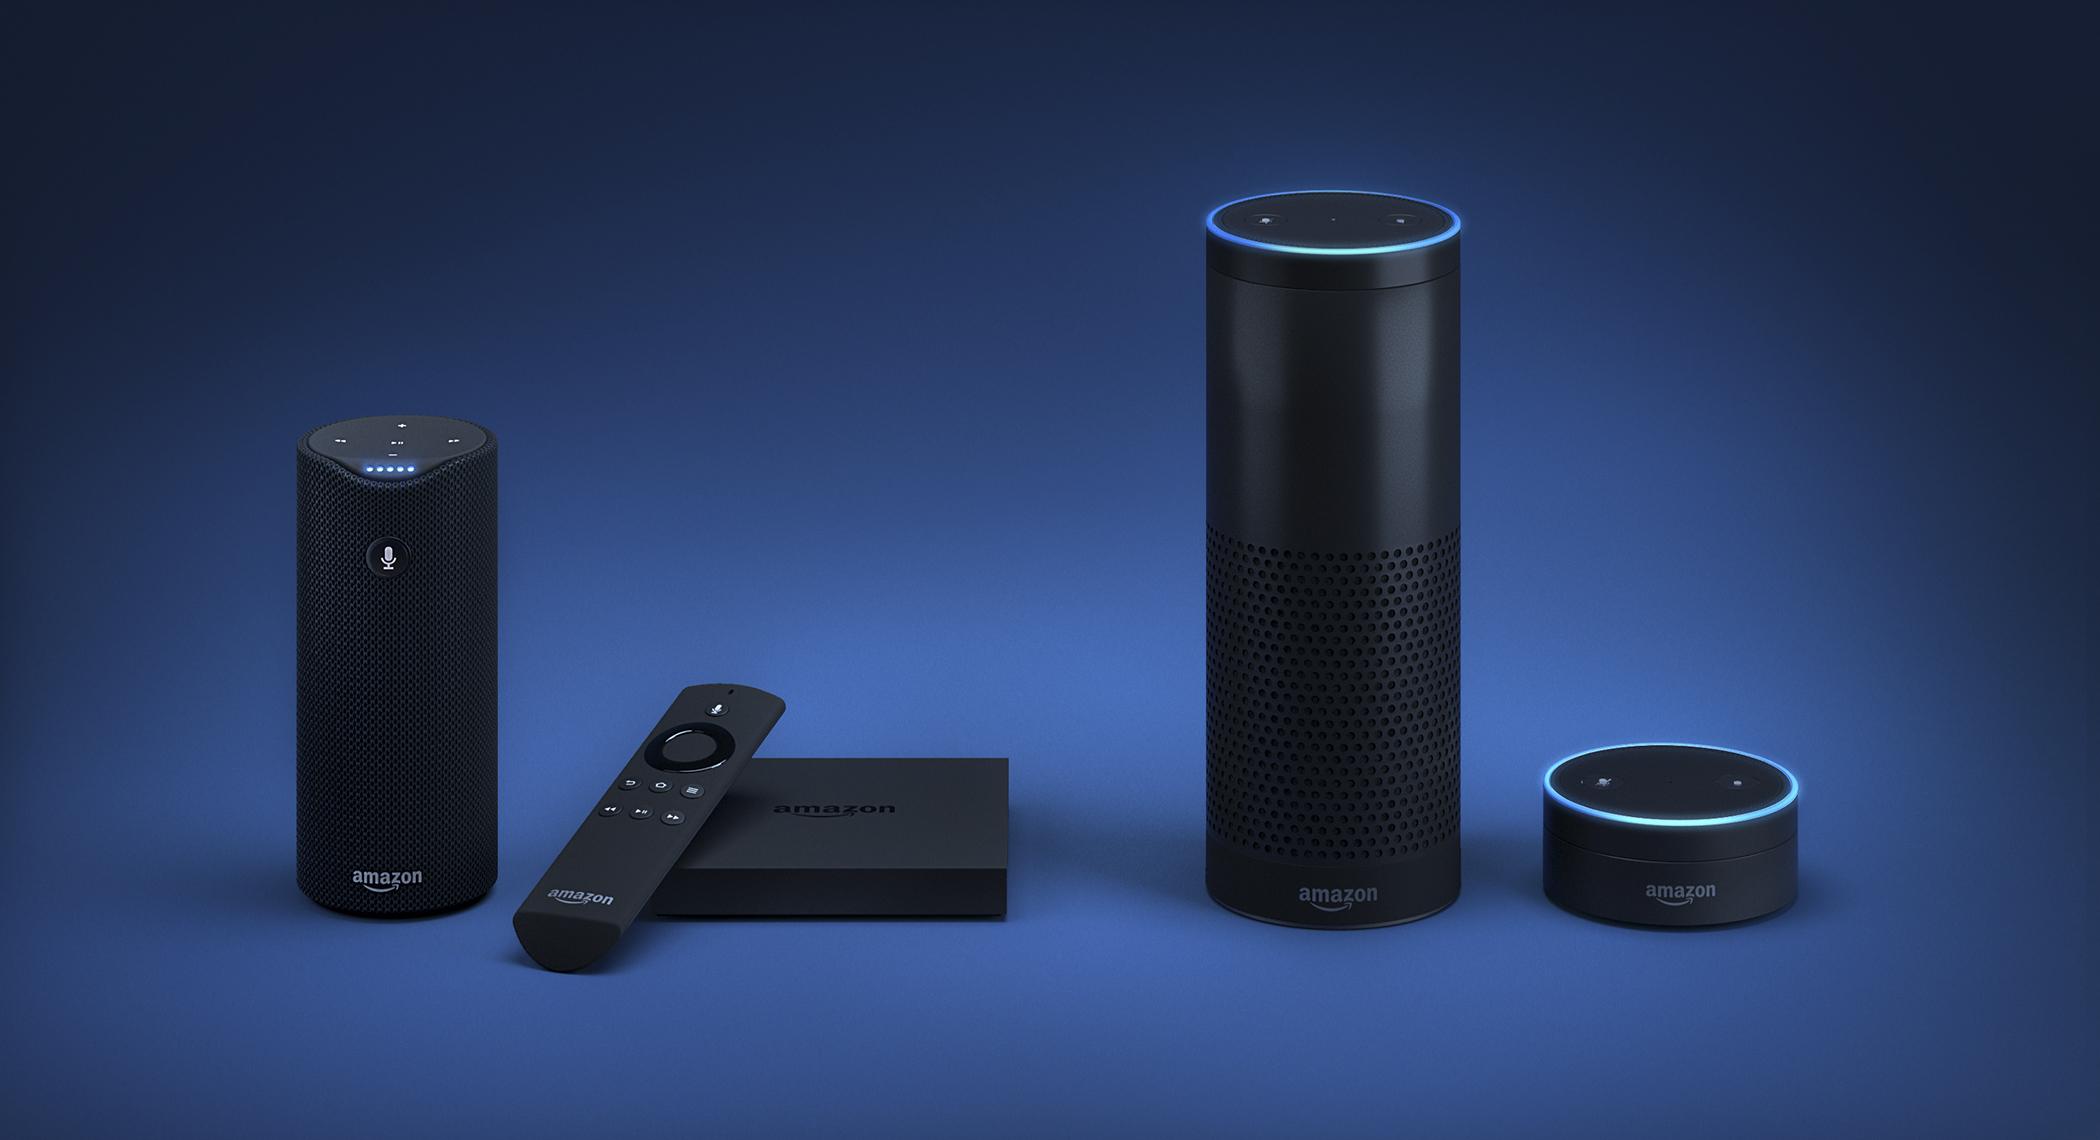 Amazons Alexa family of products